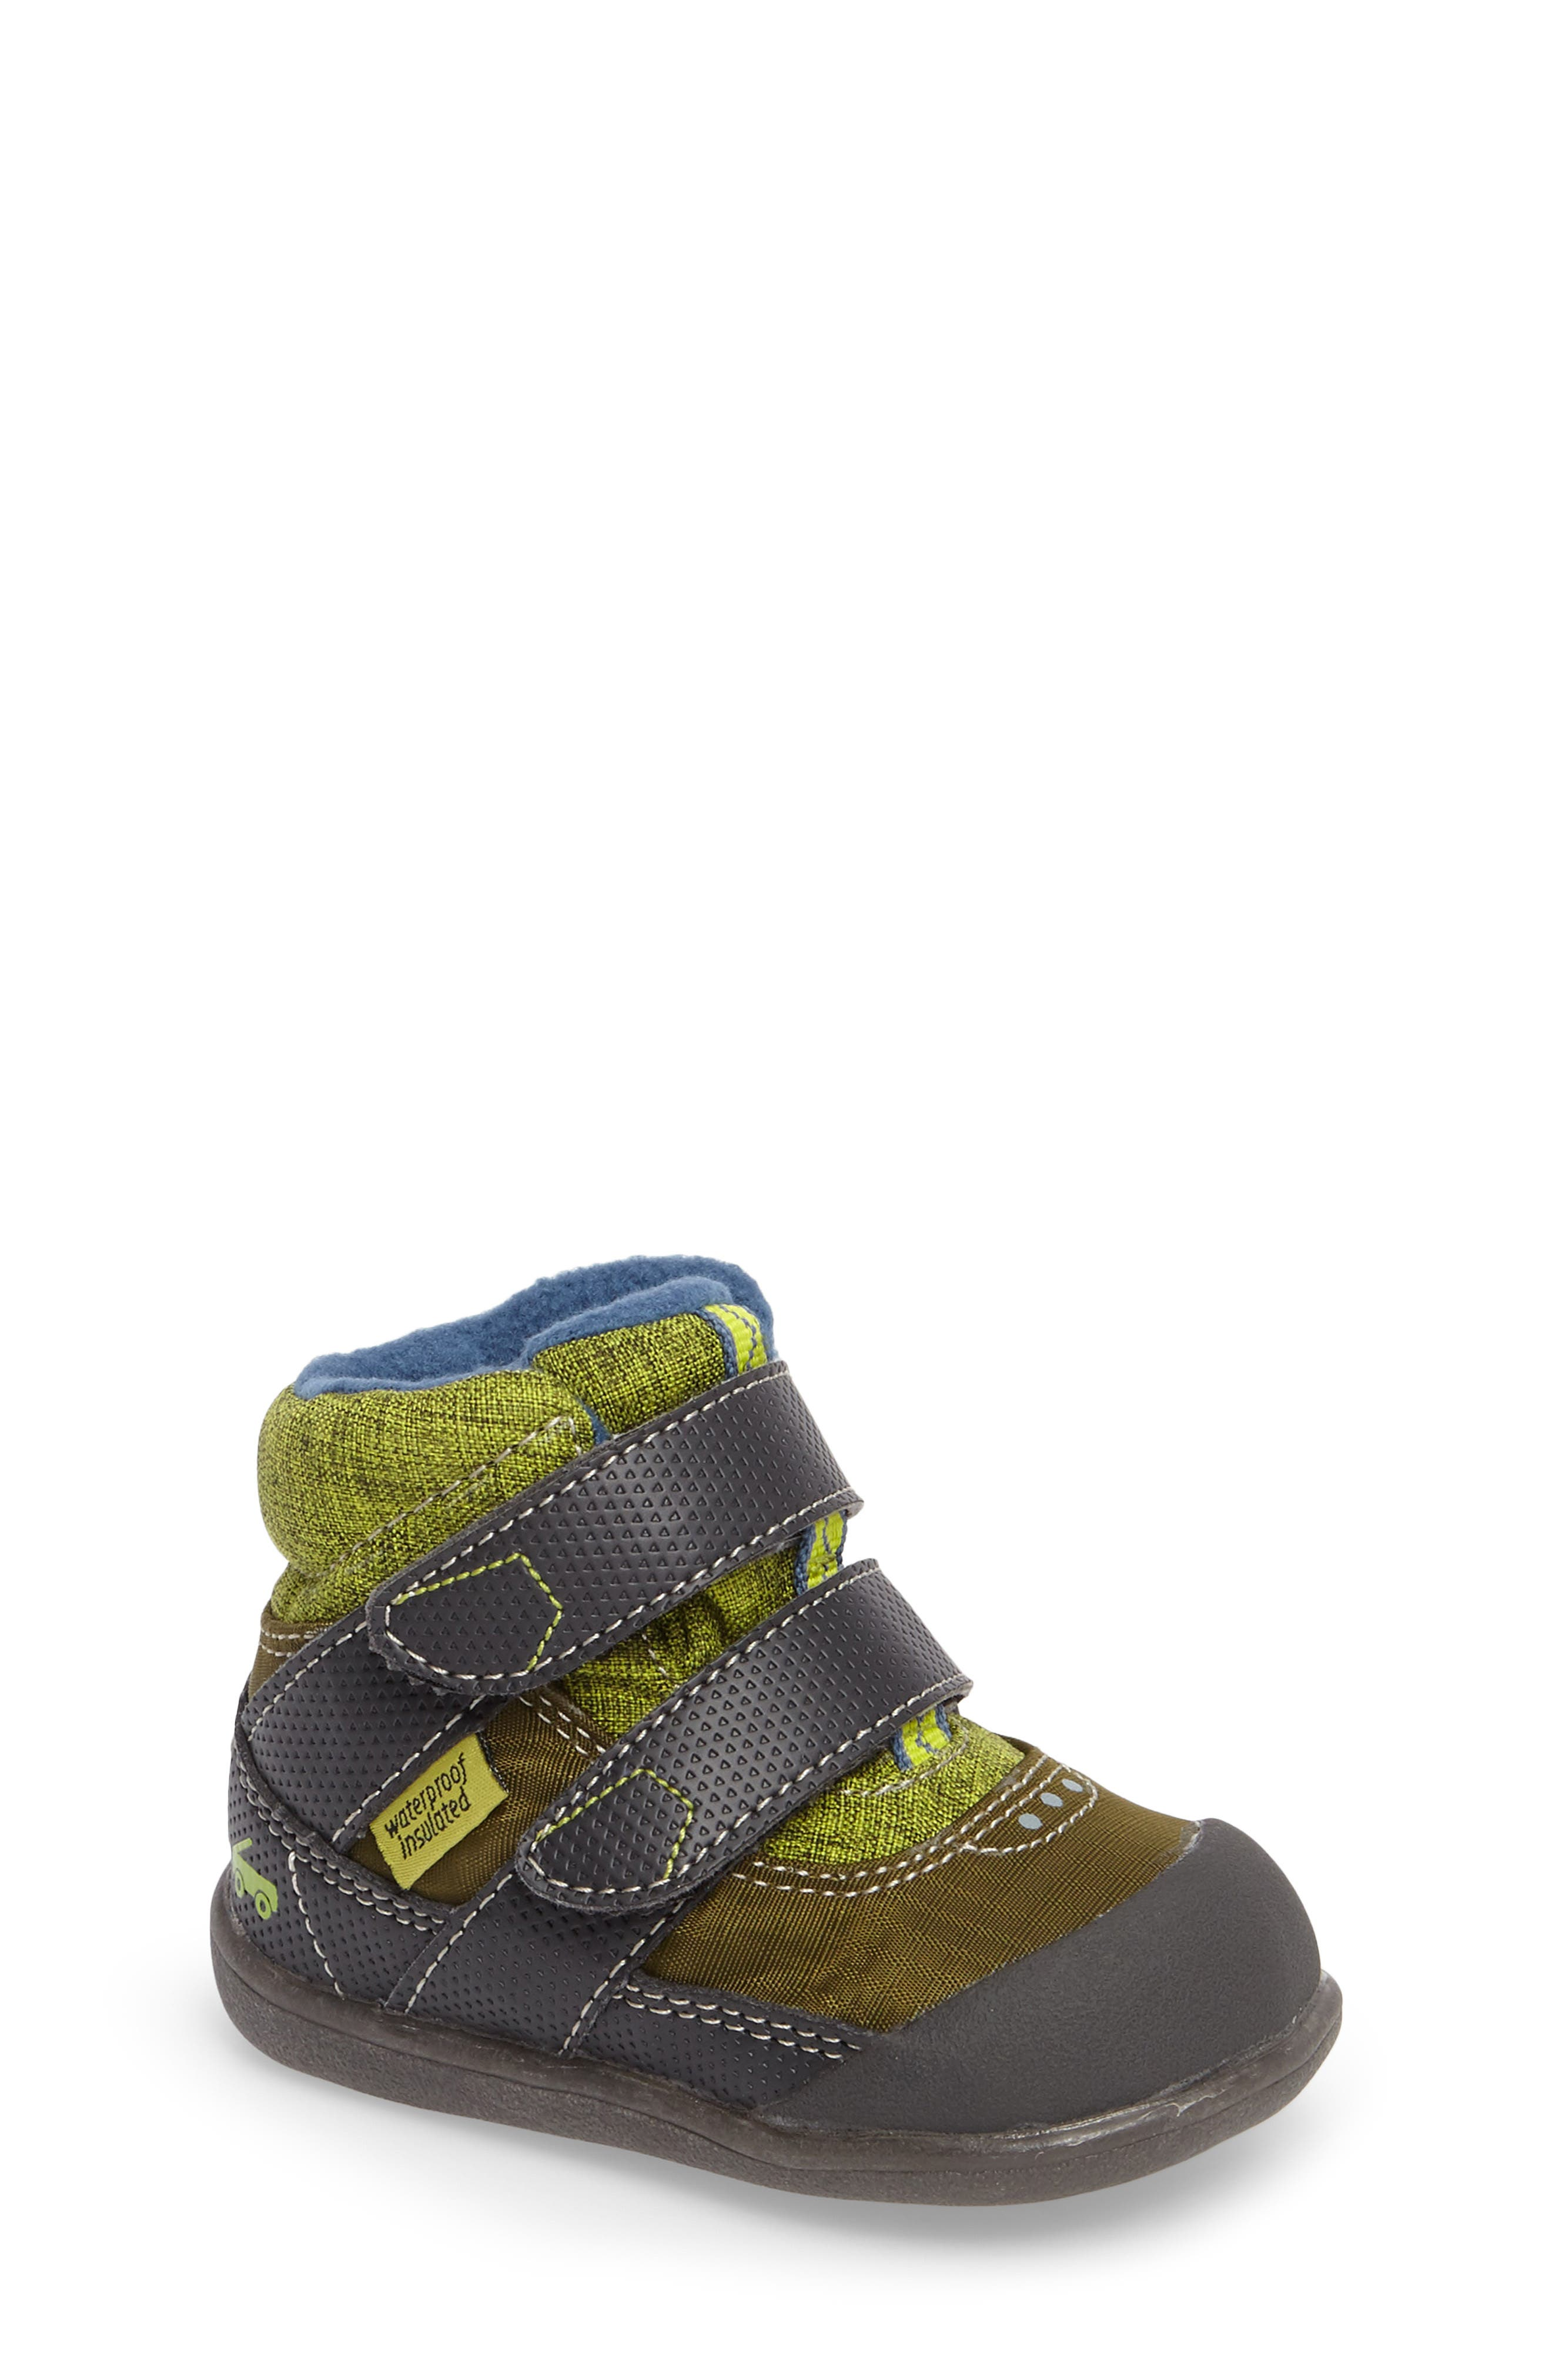 Atlas Waterproof Boot,                             Main thumbnail 1, color,                             Green